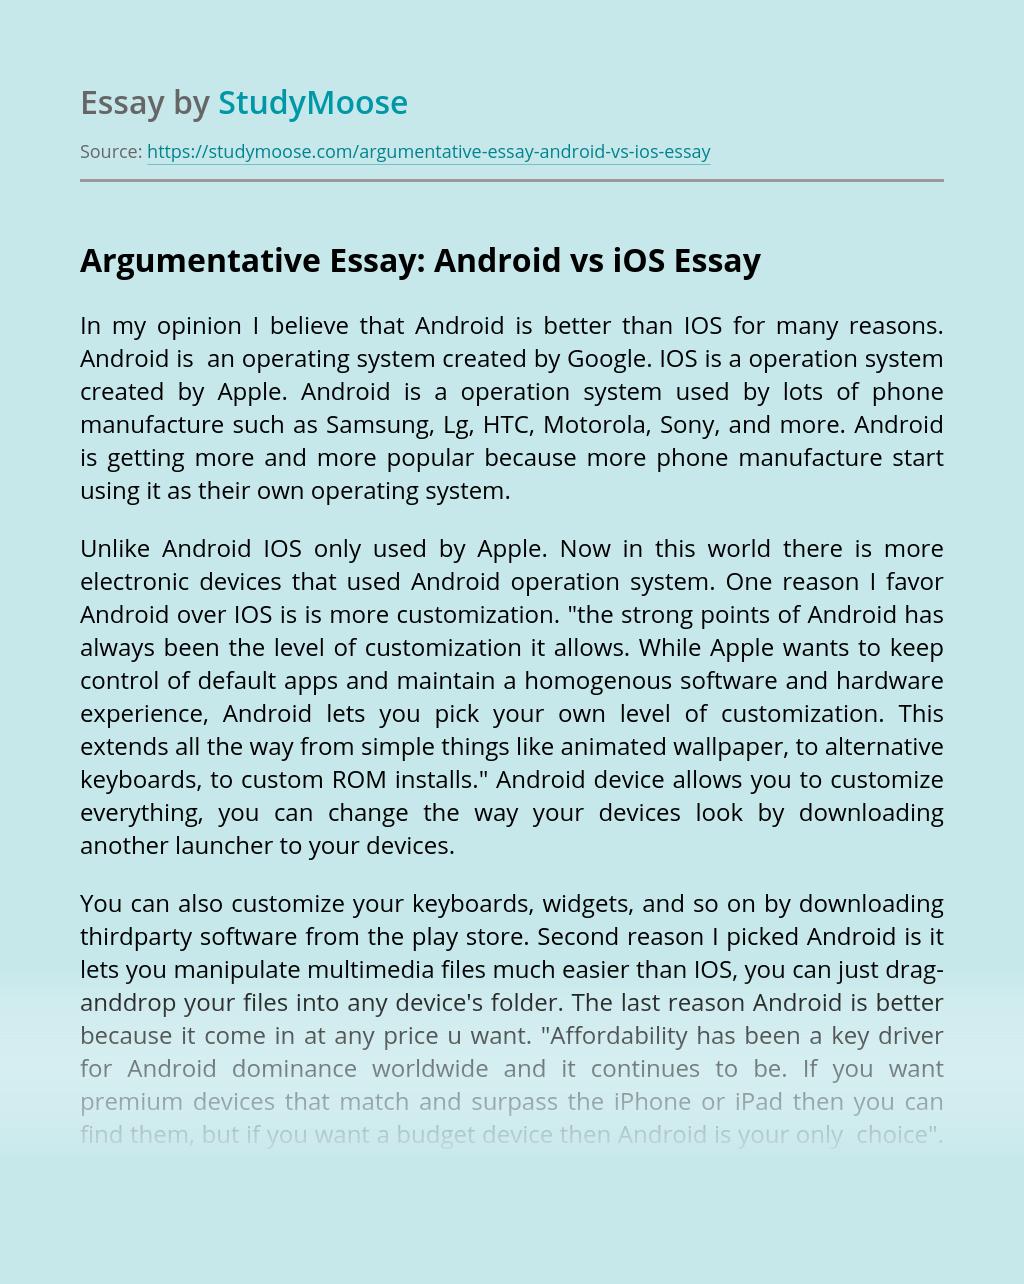 Argumentative Essay: Android vs iOS